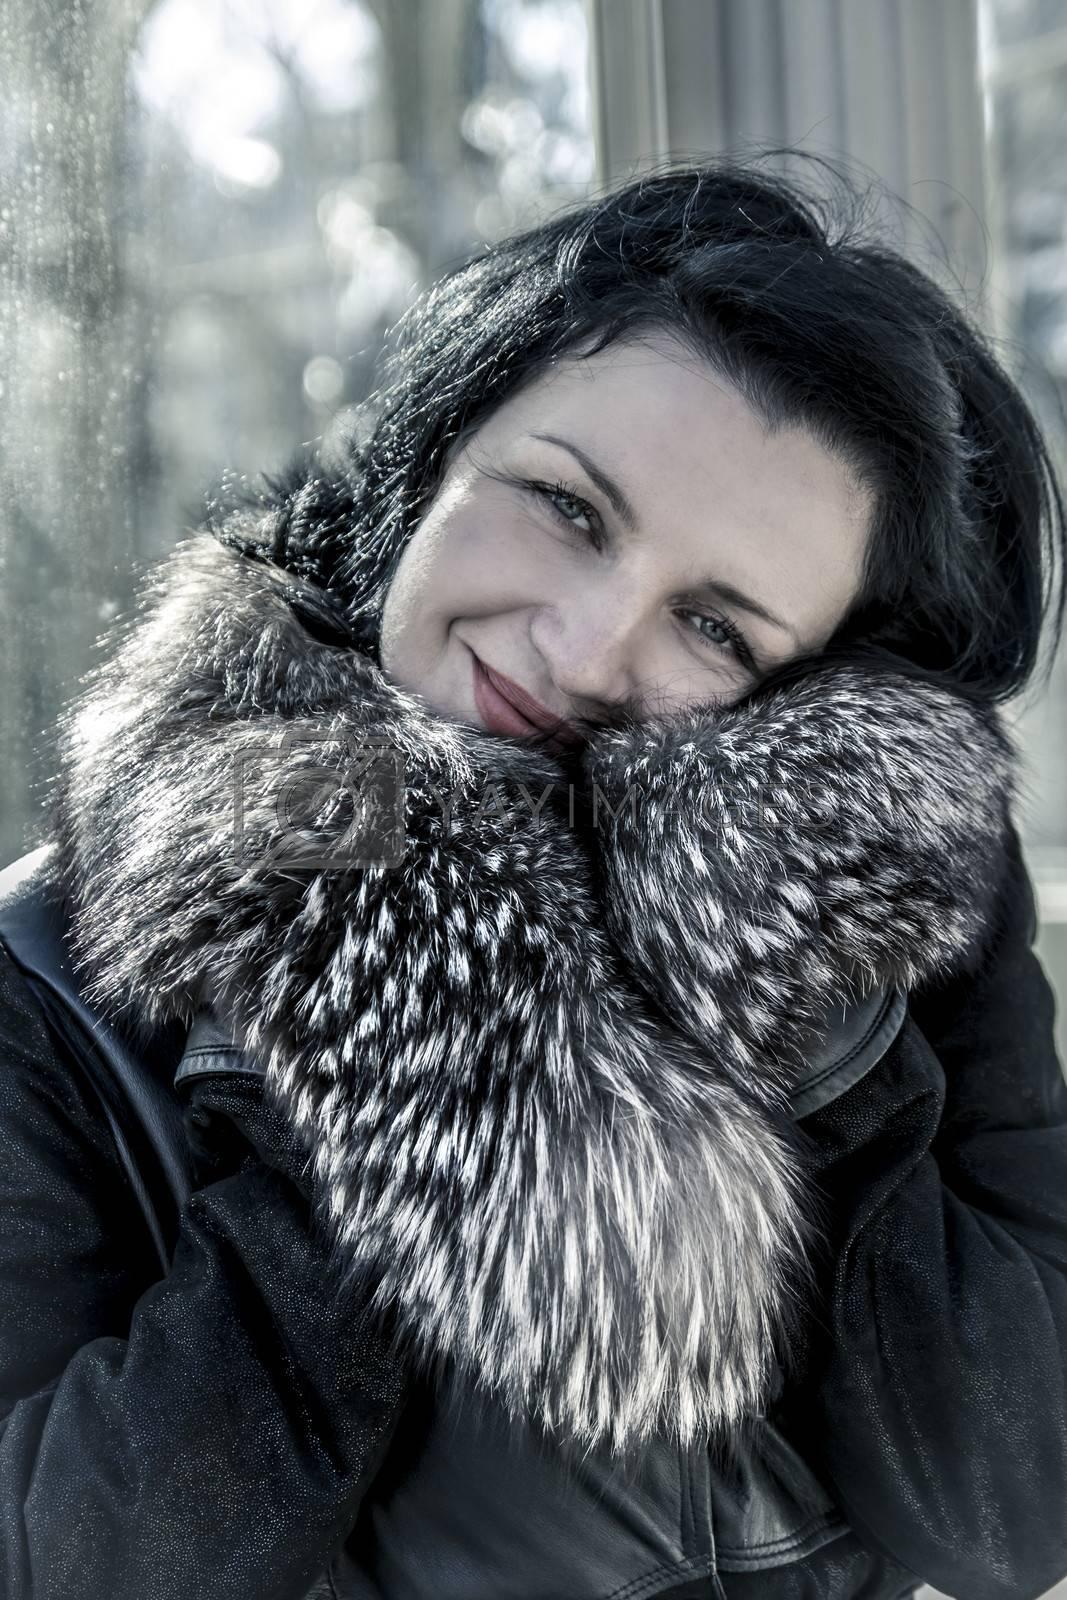 Luxury.Beautiful woman in winter.Beauty Fashion Model Girl in a Fur Hat. Russian Stylish young.Portrait.